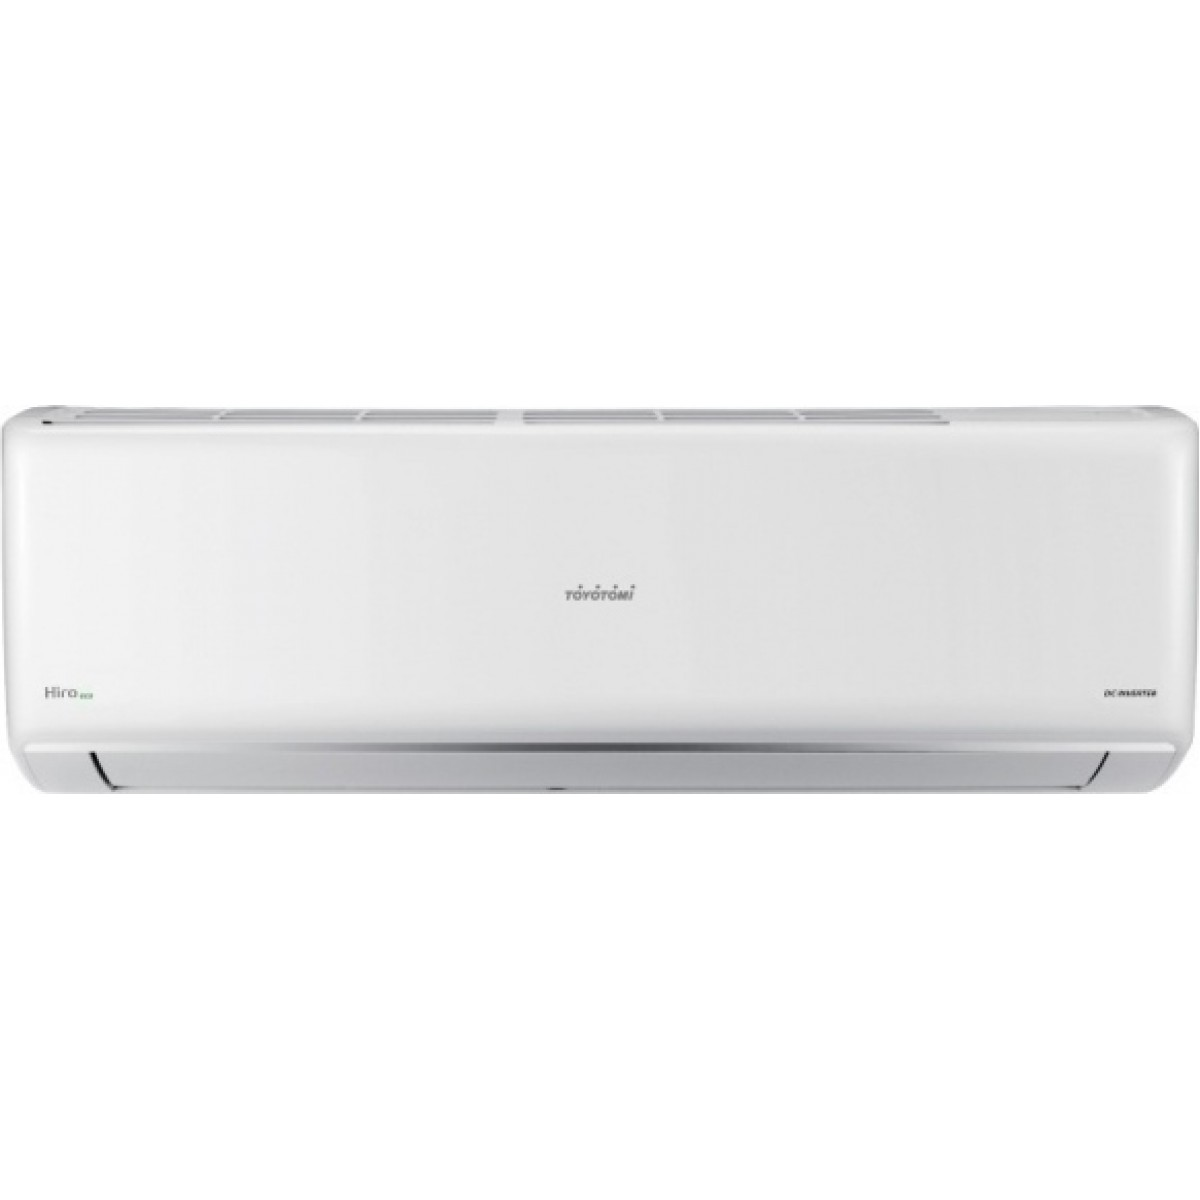 Toyotomi Hiro Eco HTN/HTG-712R32 κλιματιστικό Inverter Wi Fi 1200btu Inverter Ηλεκτρικες Συσκευες - homeelectrics.gr